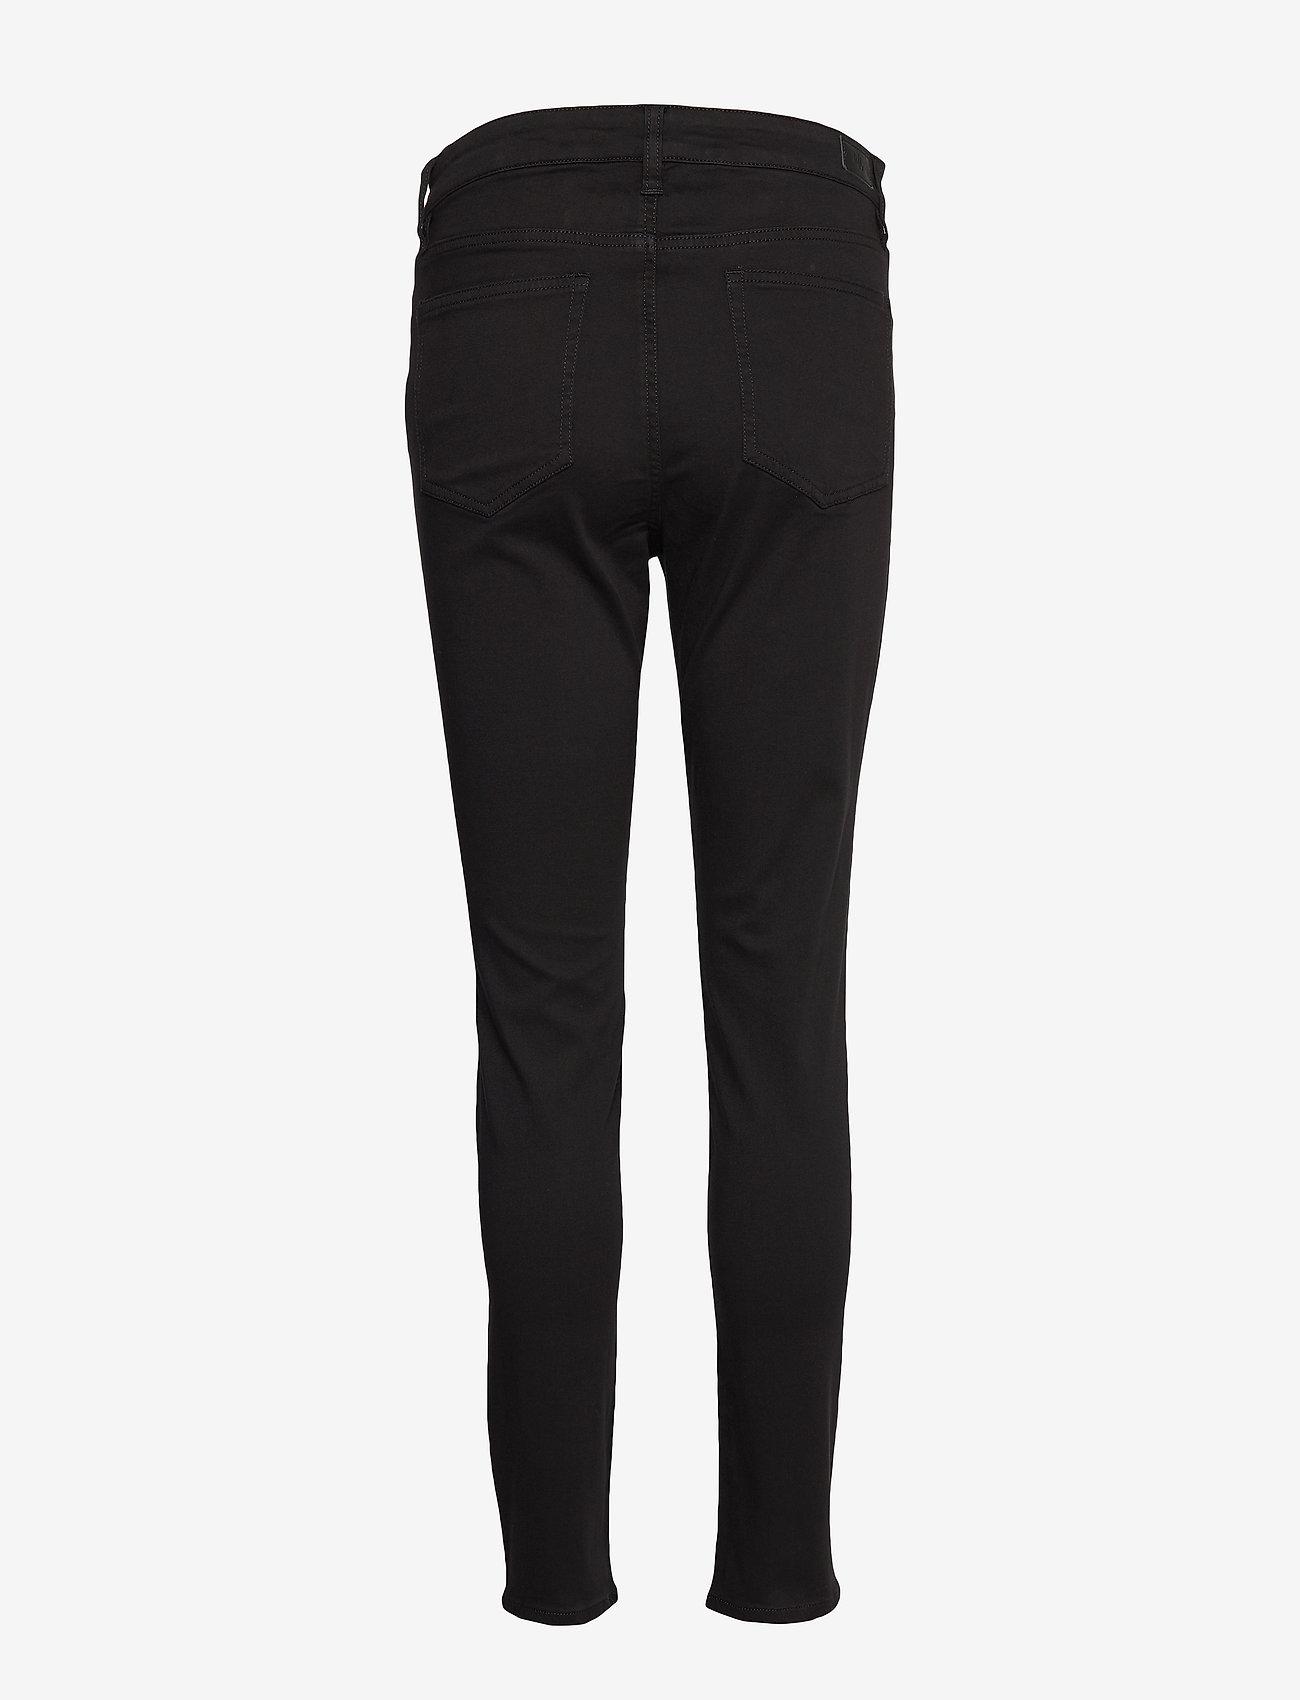 Lauren Ralph Lauren - PCDYE WASHED SATEEN-PANT - broeken med skinny fit - polo black - 1